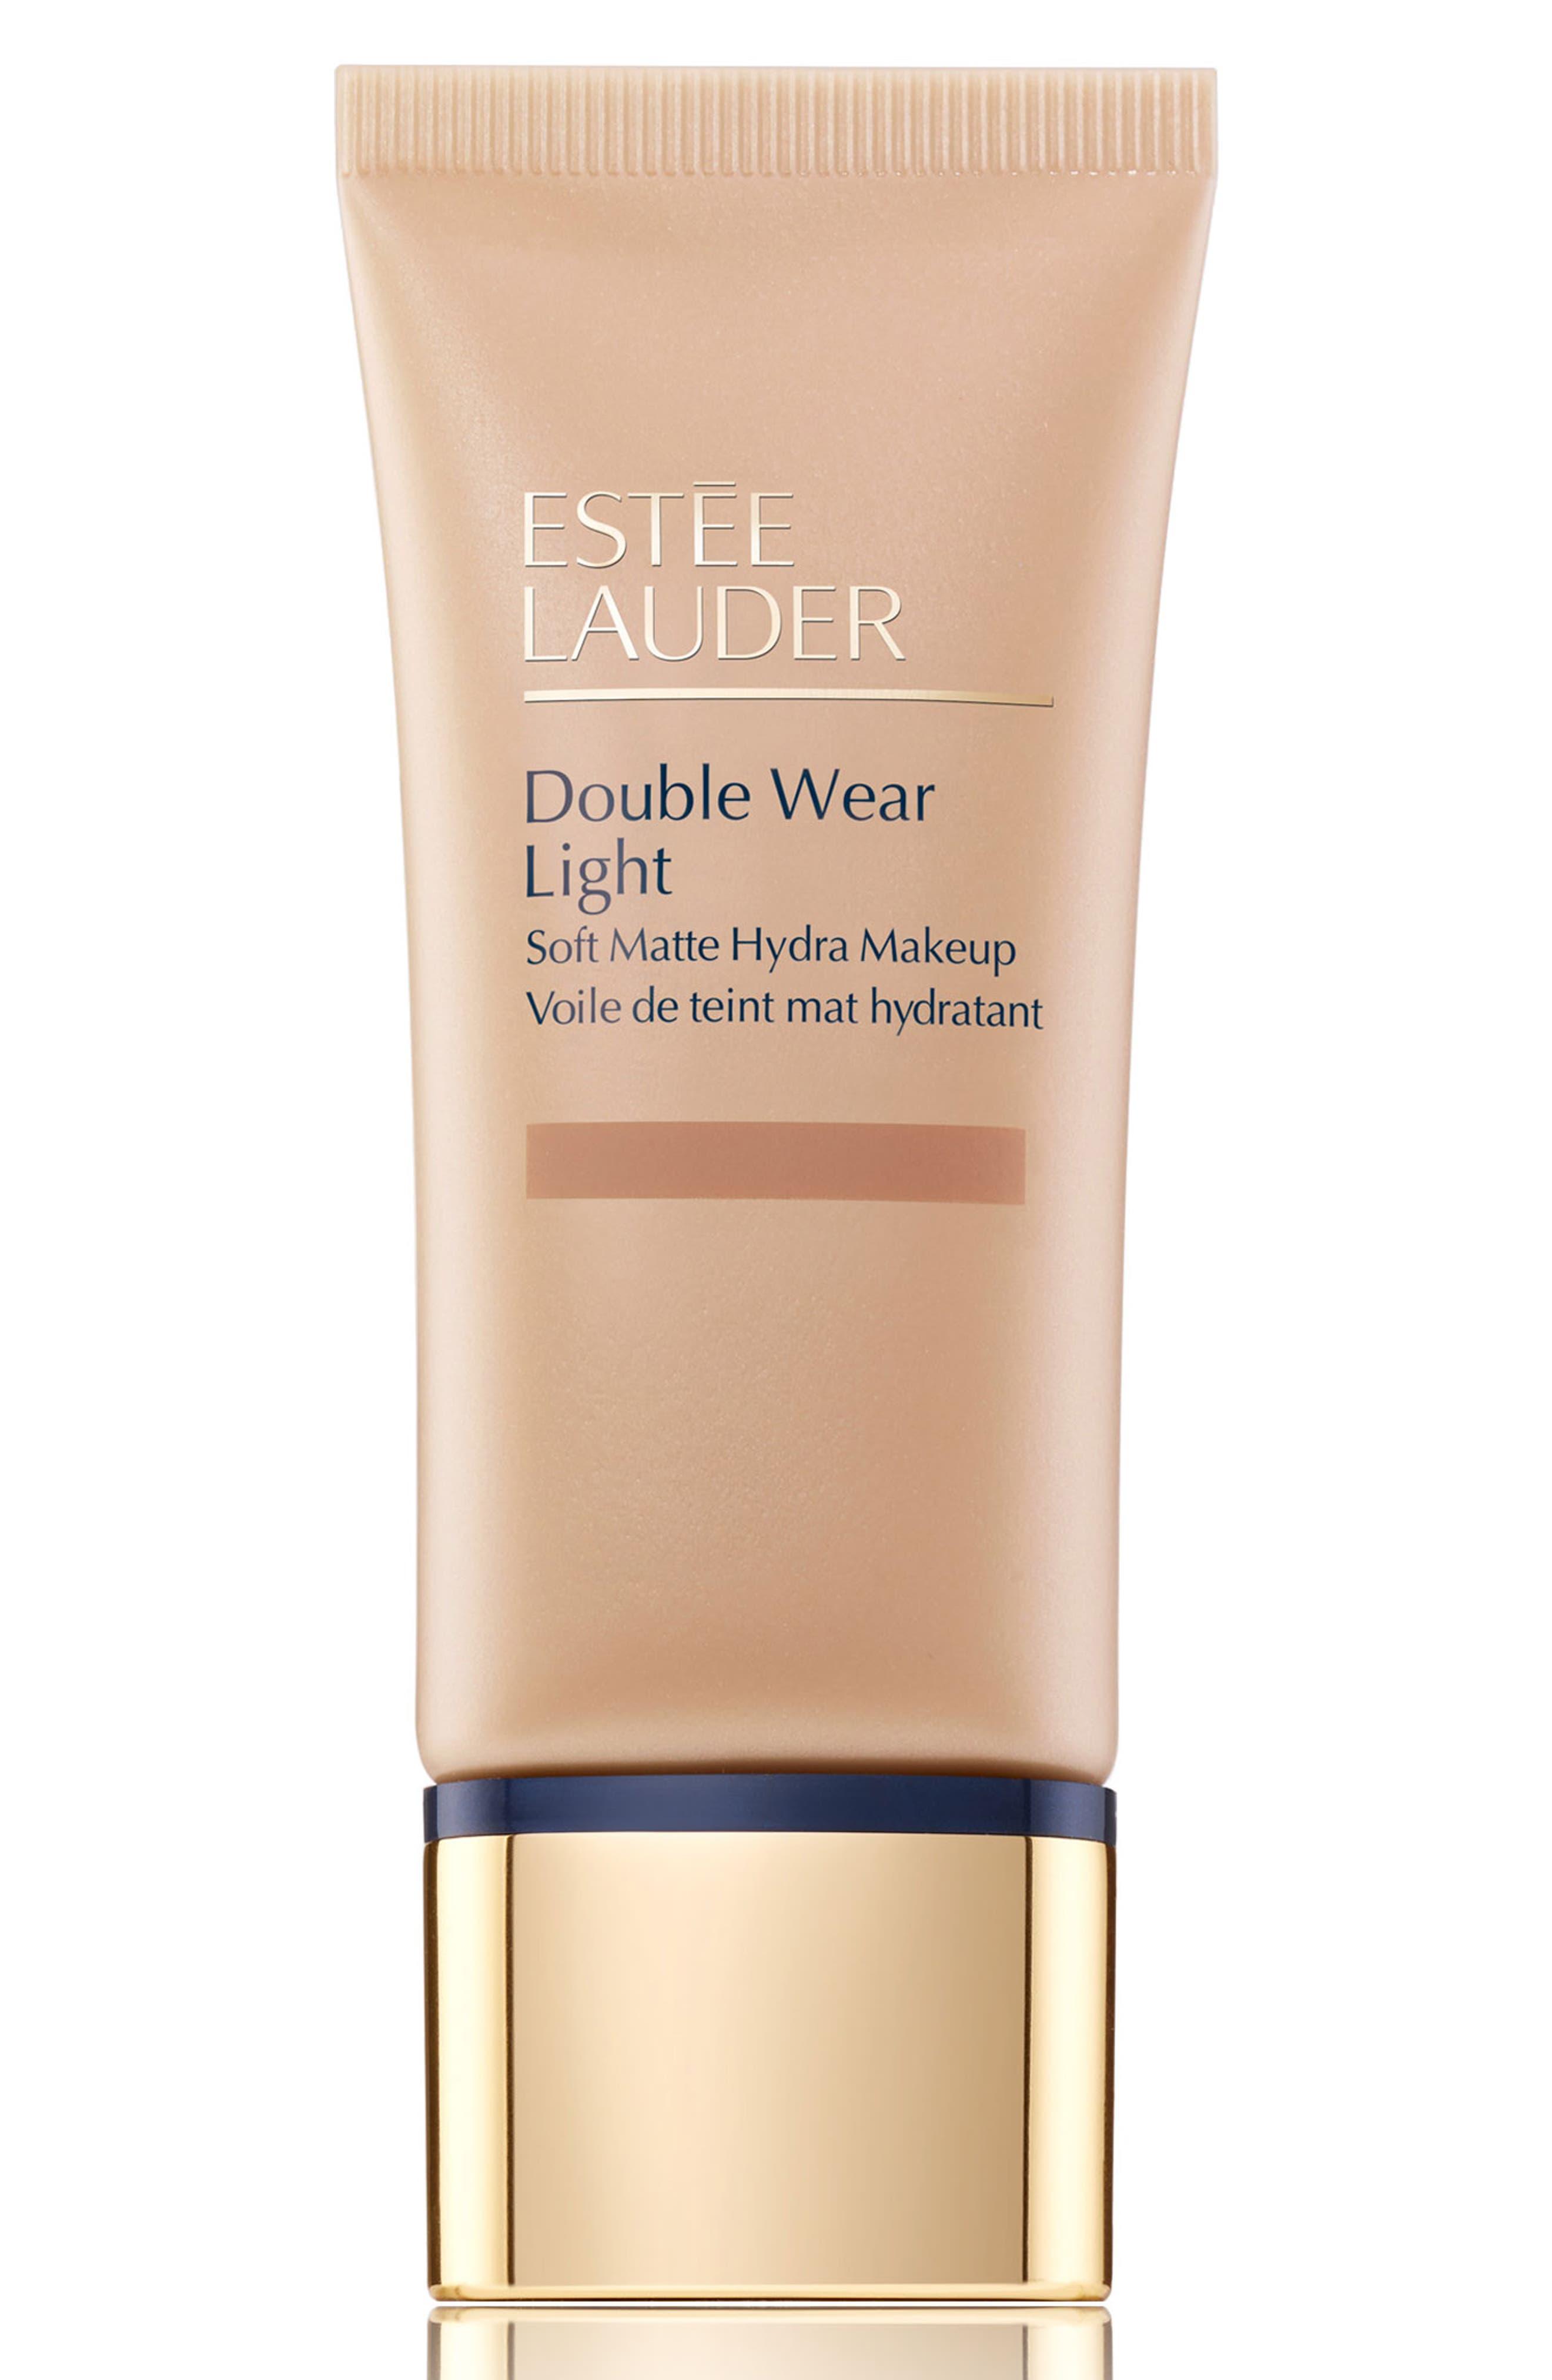 Estee Lauder Double Wear Light Soft Matte Hydra Makeup - 4C3 Soft Tan